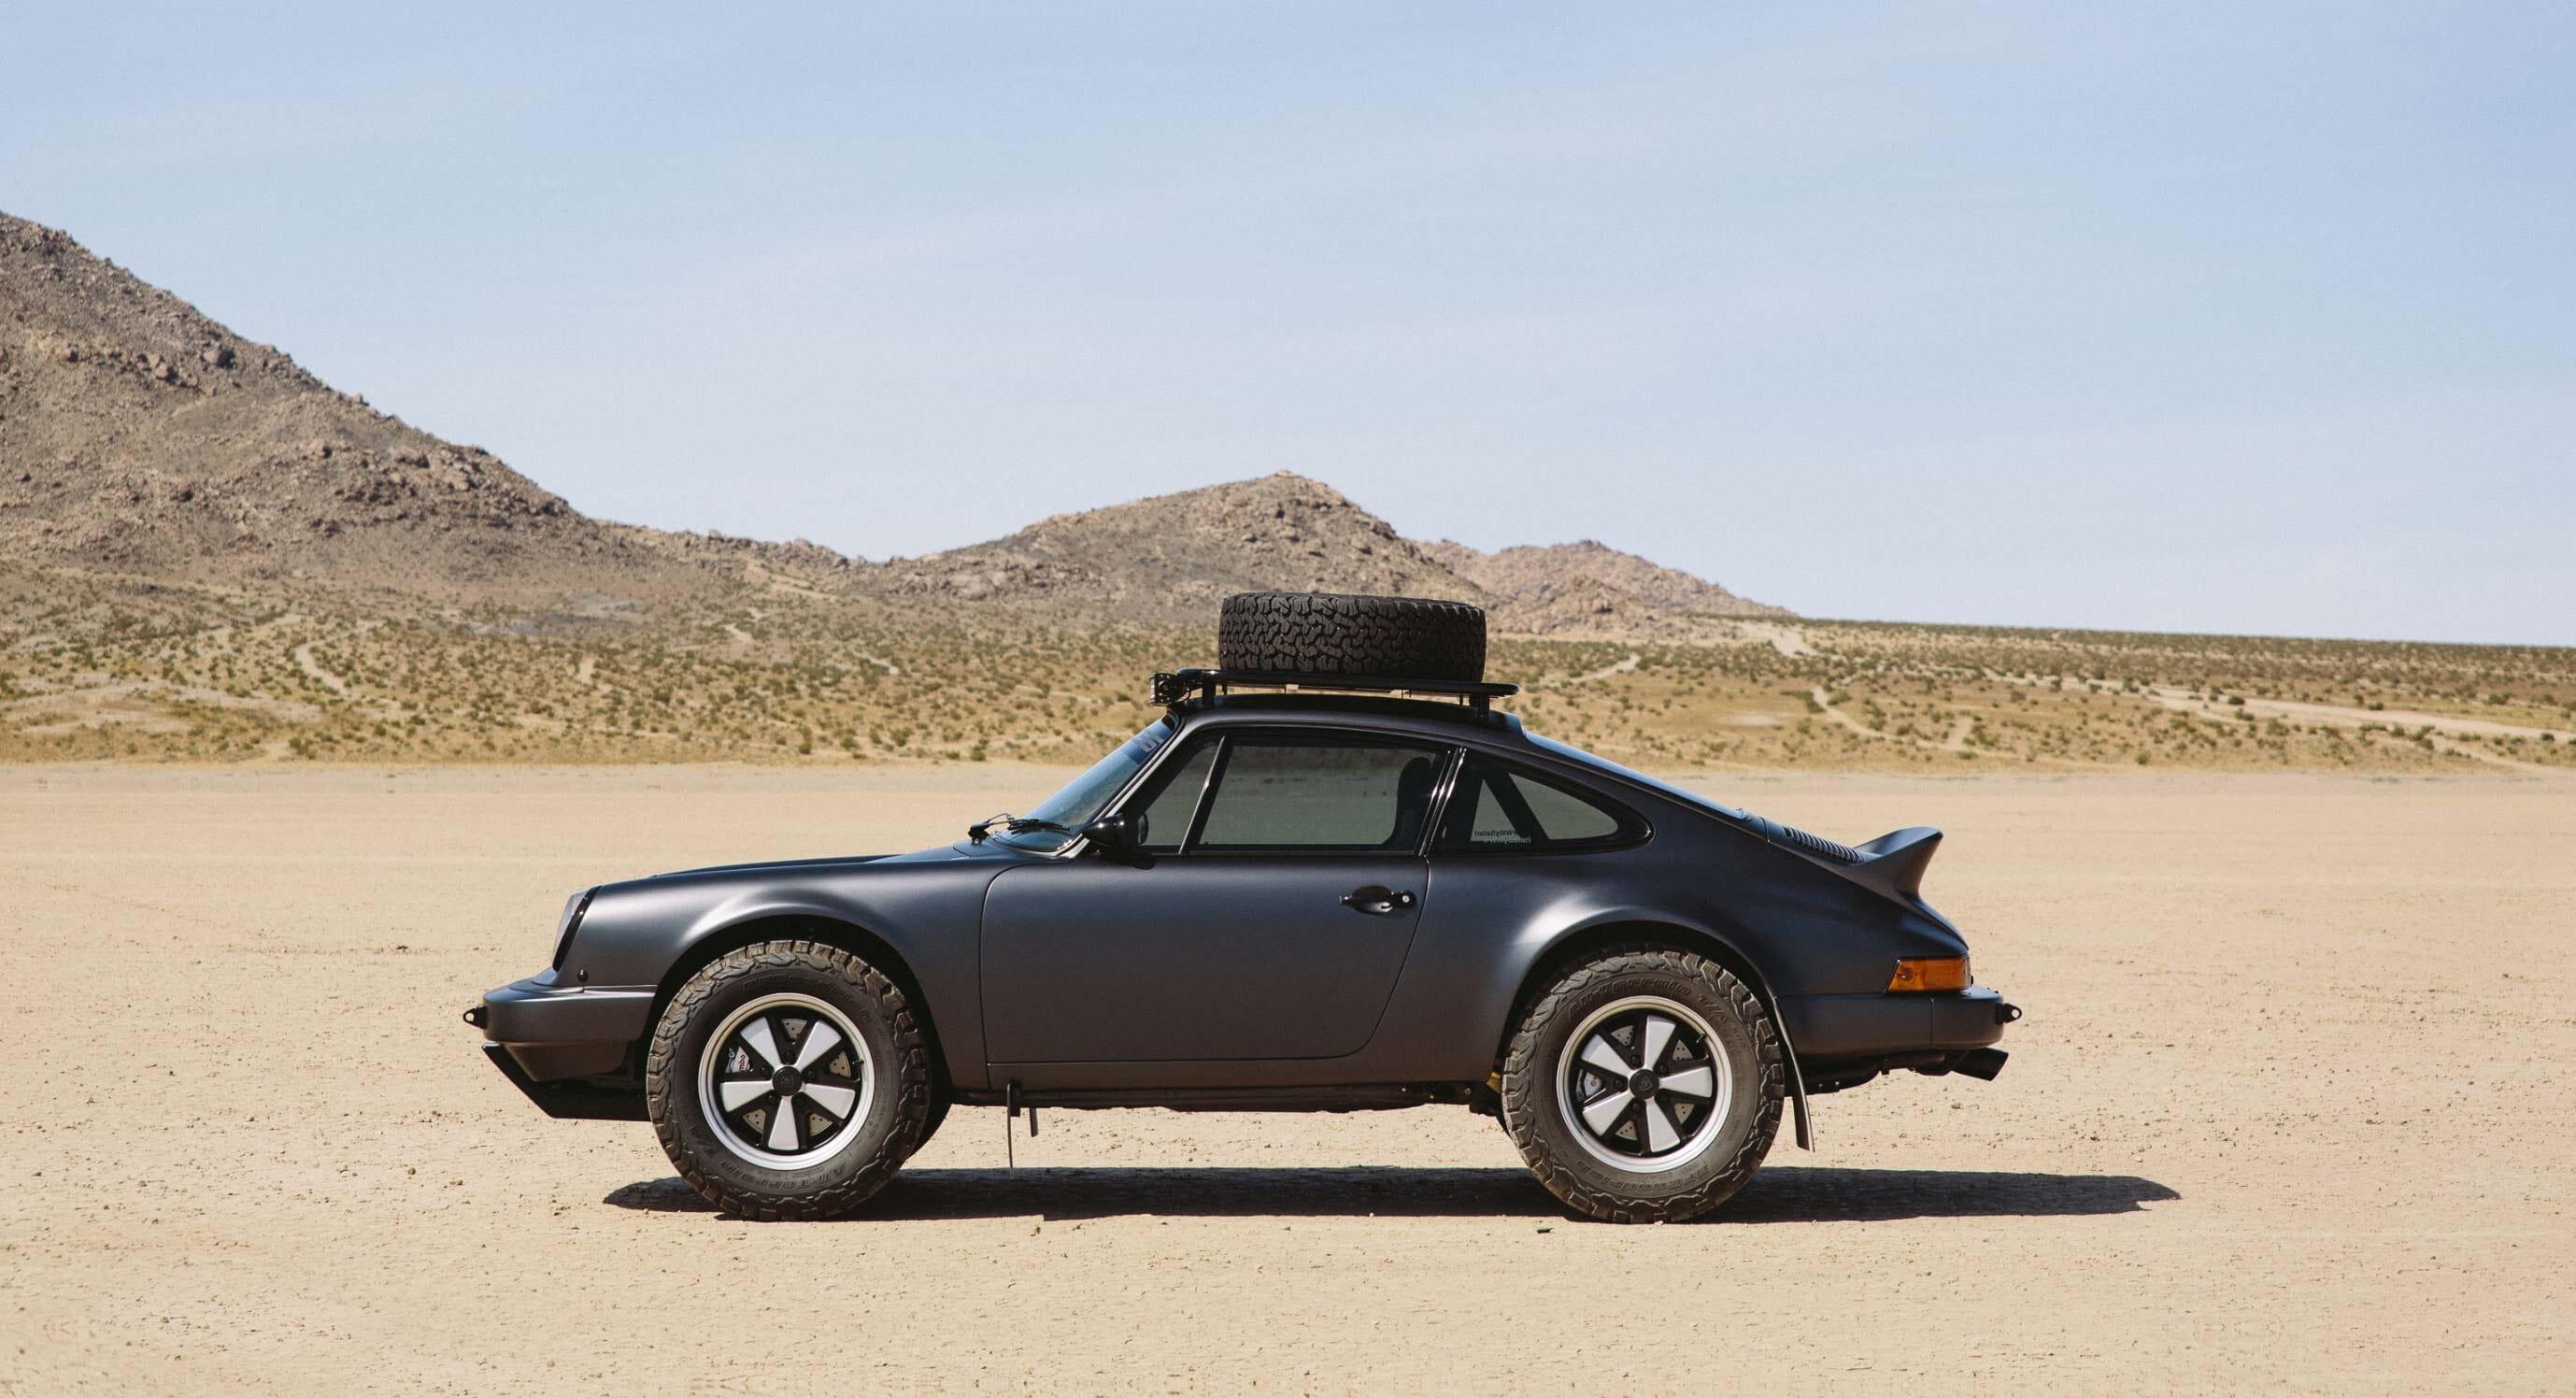 A 1984 Porsche 911 Carrera Made For More